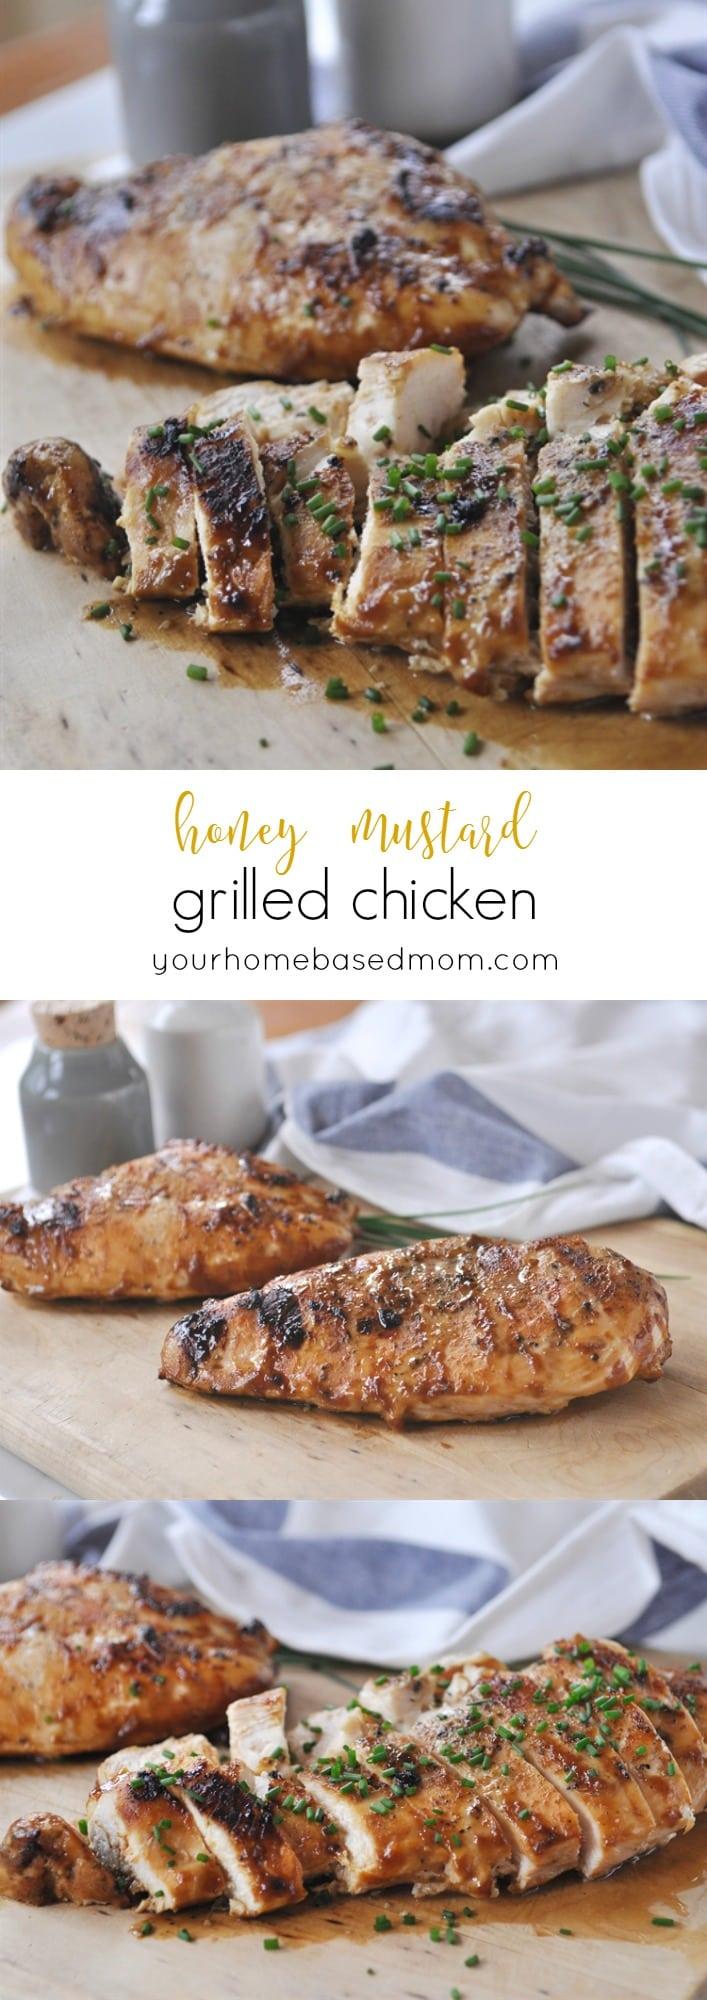 Honey Mustard Grilled Chicken @yourhomebasedmom.com